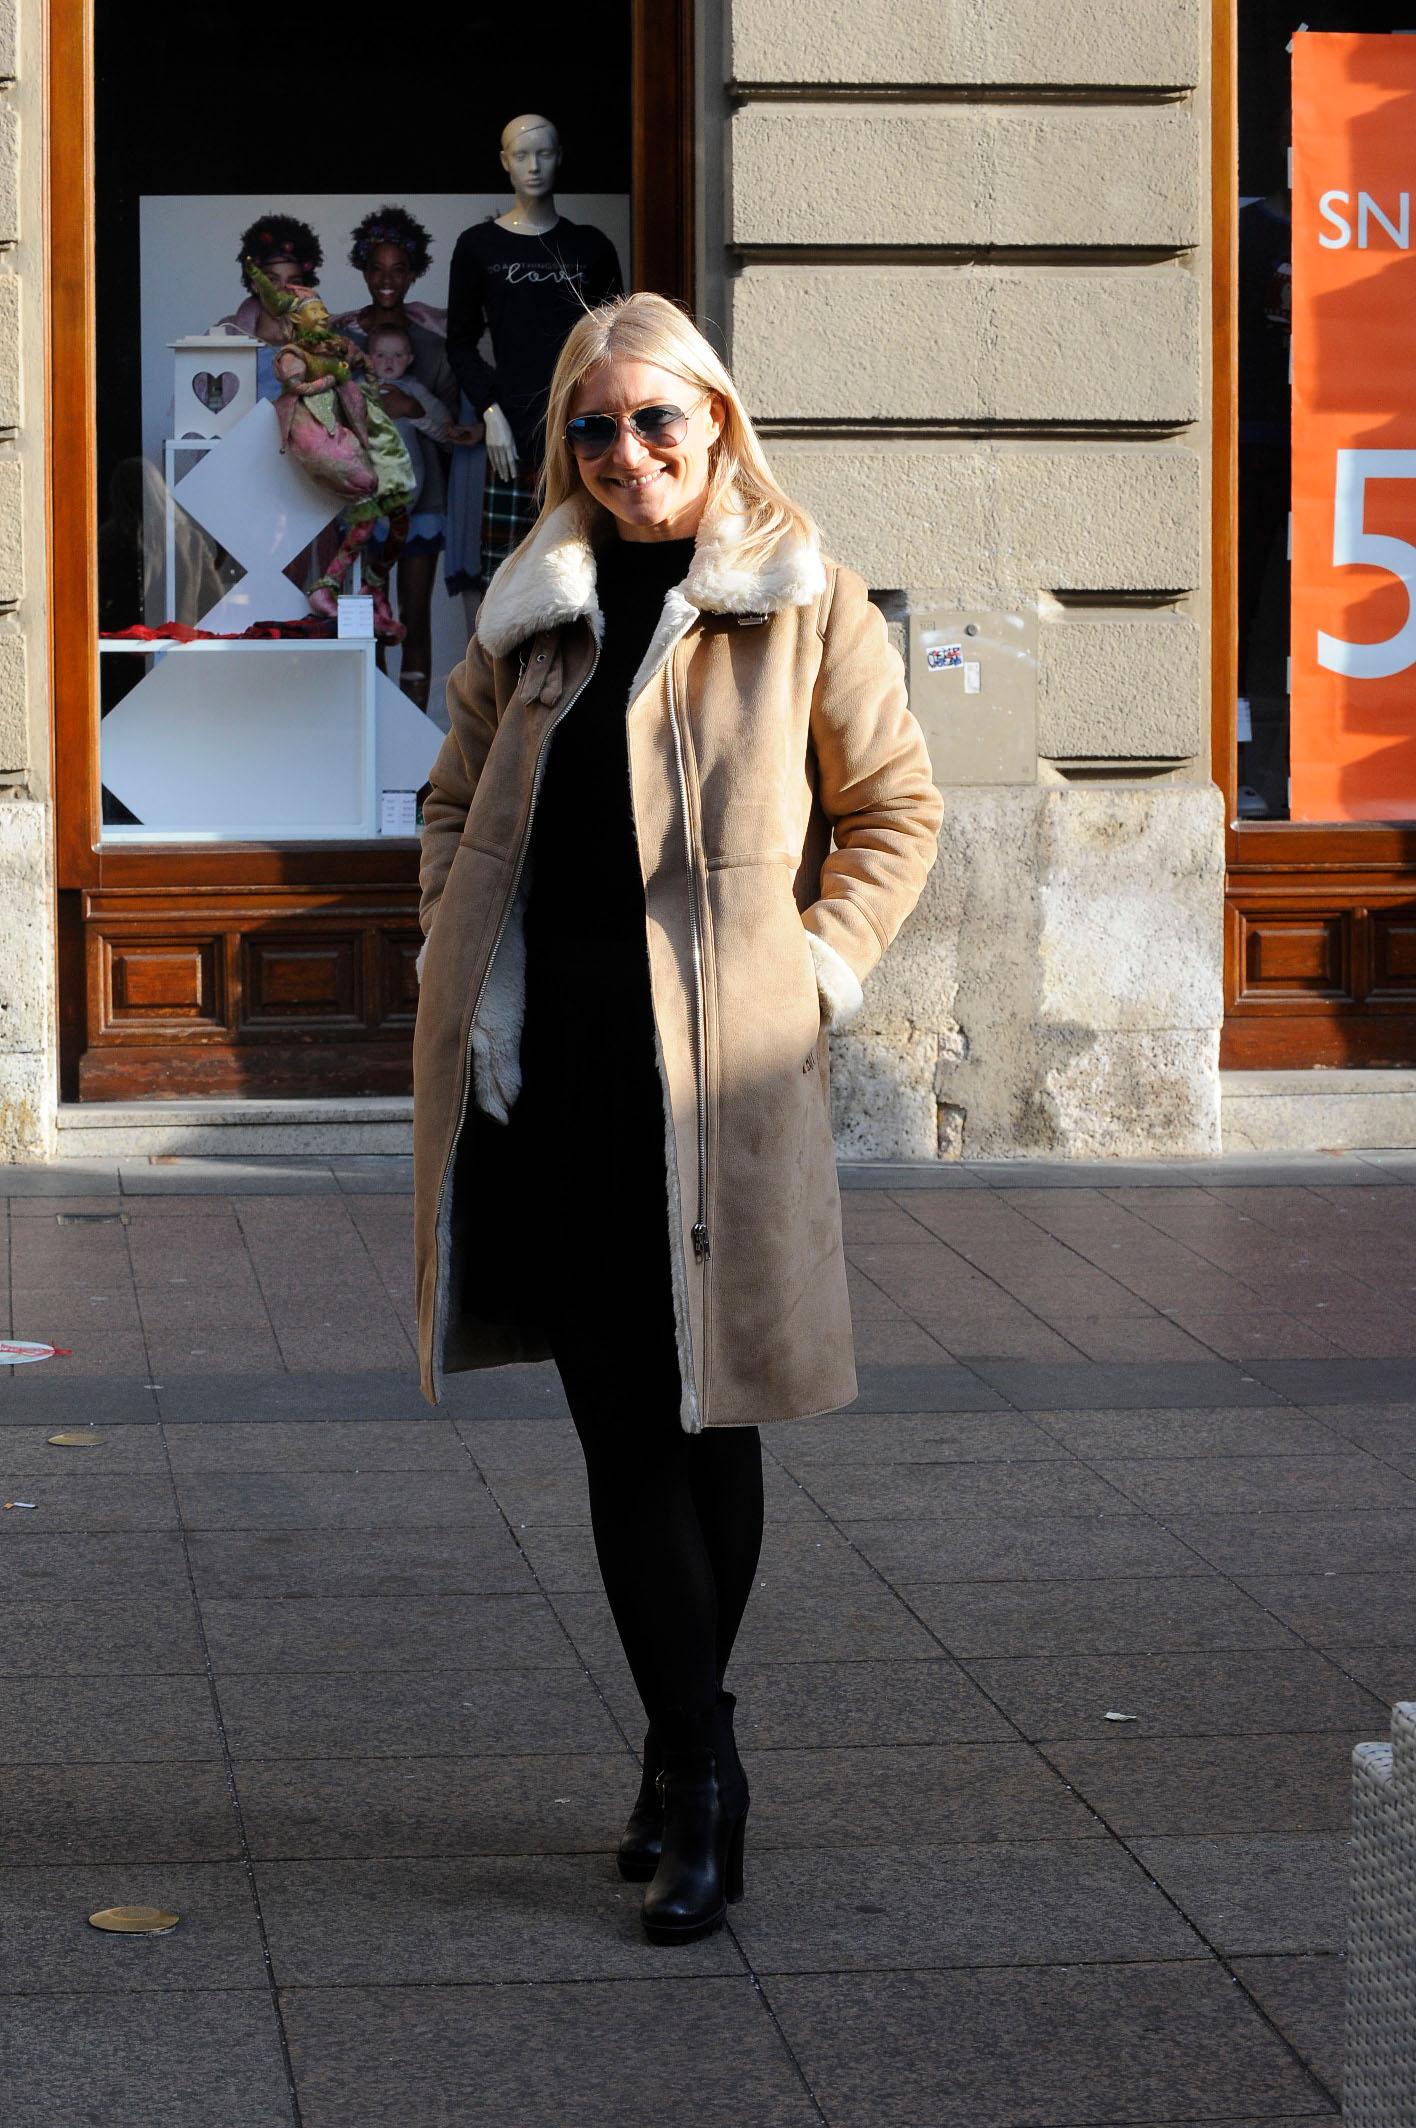 Spica / Zagreb 29.12.2018. / foto: Davor Matota / Ursula Tolj